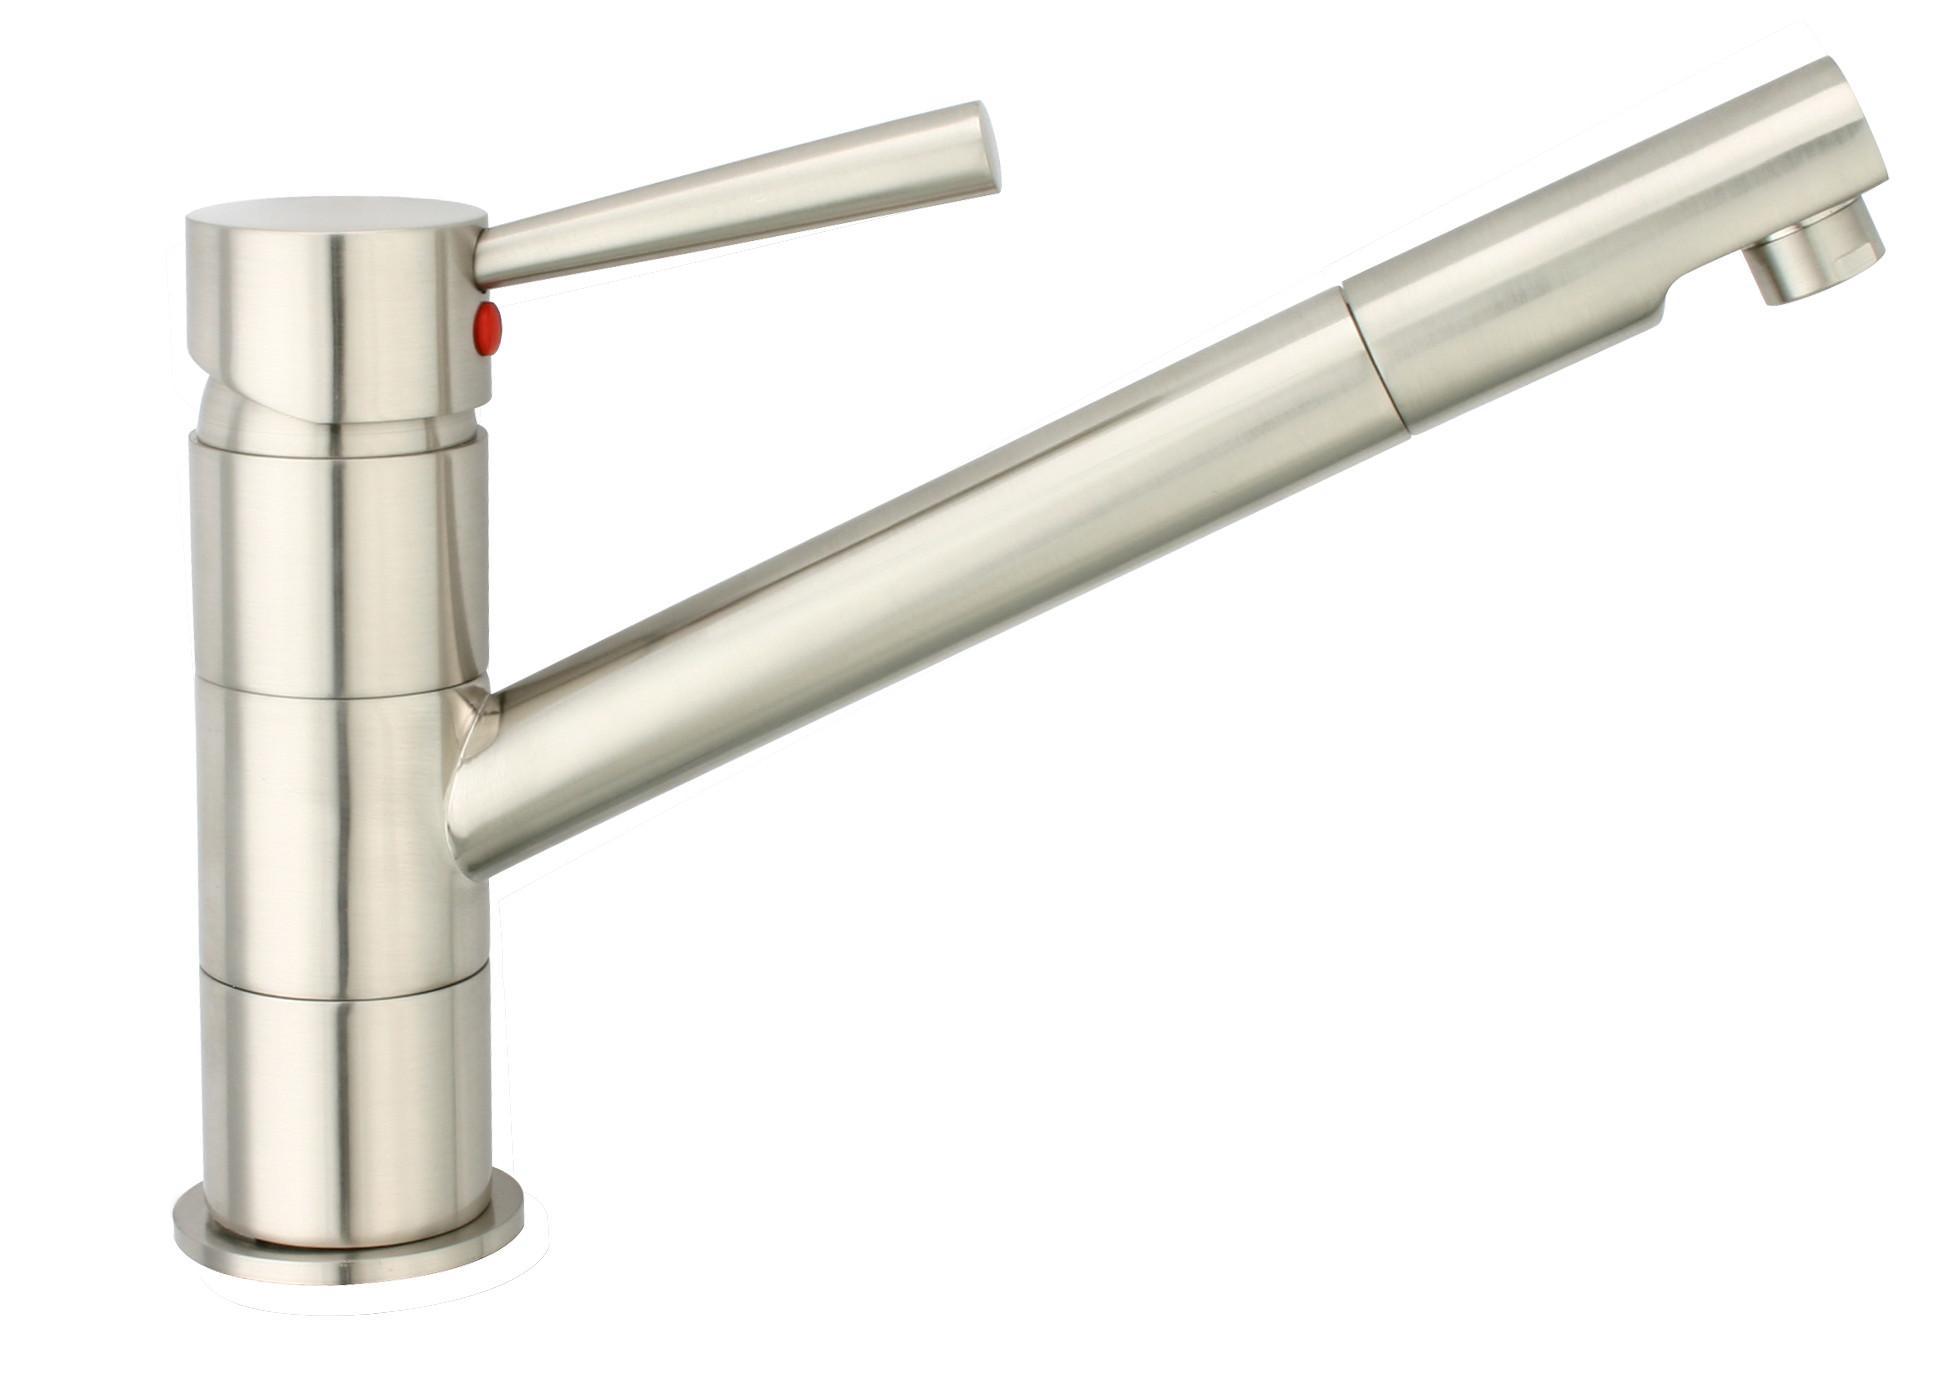 Spültischarmatur Cornwall - Edelstahlfarben, LIFESTYLE, Kunststoff/Metall (18cm)